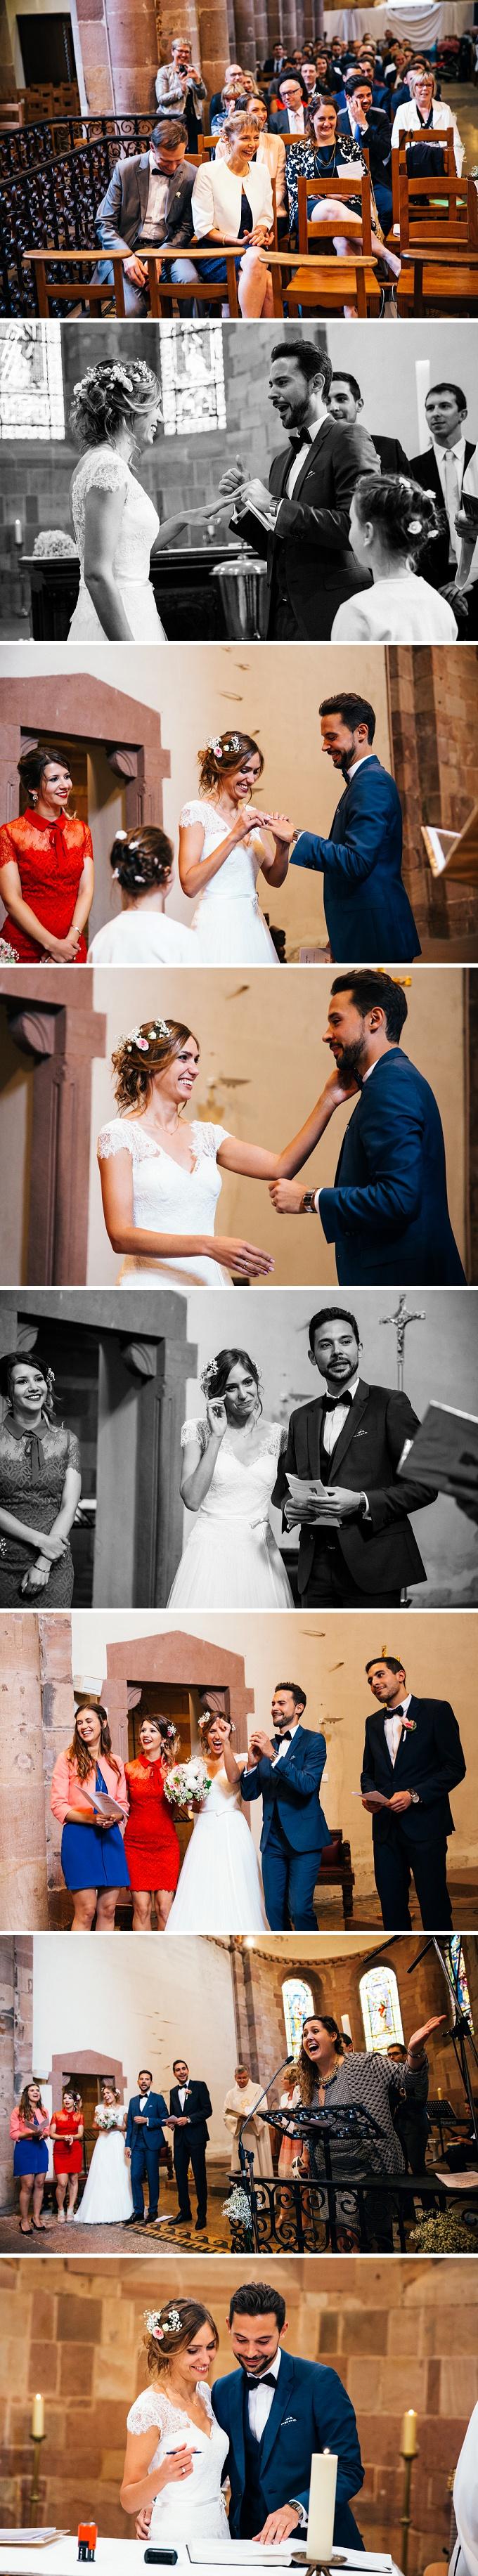 mariage-chateau-dosthoffen-014.jpg